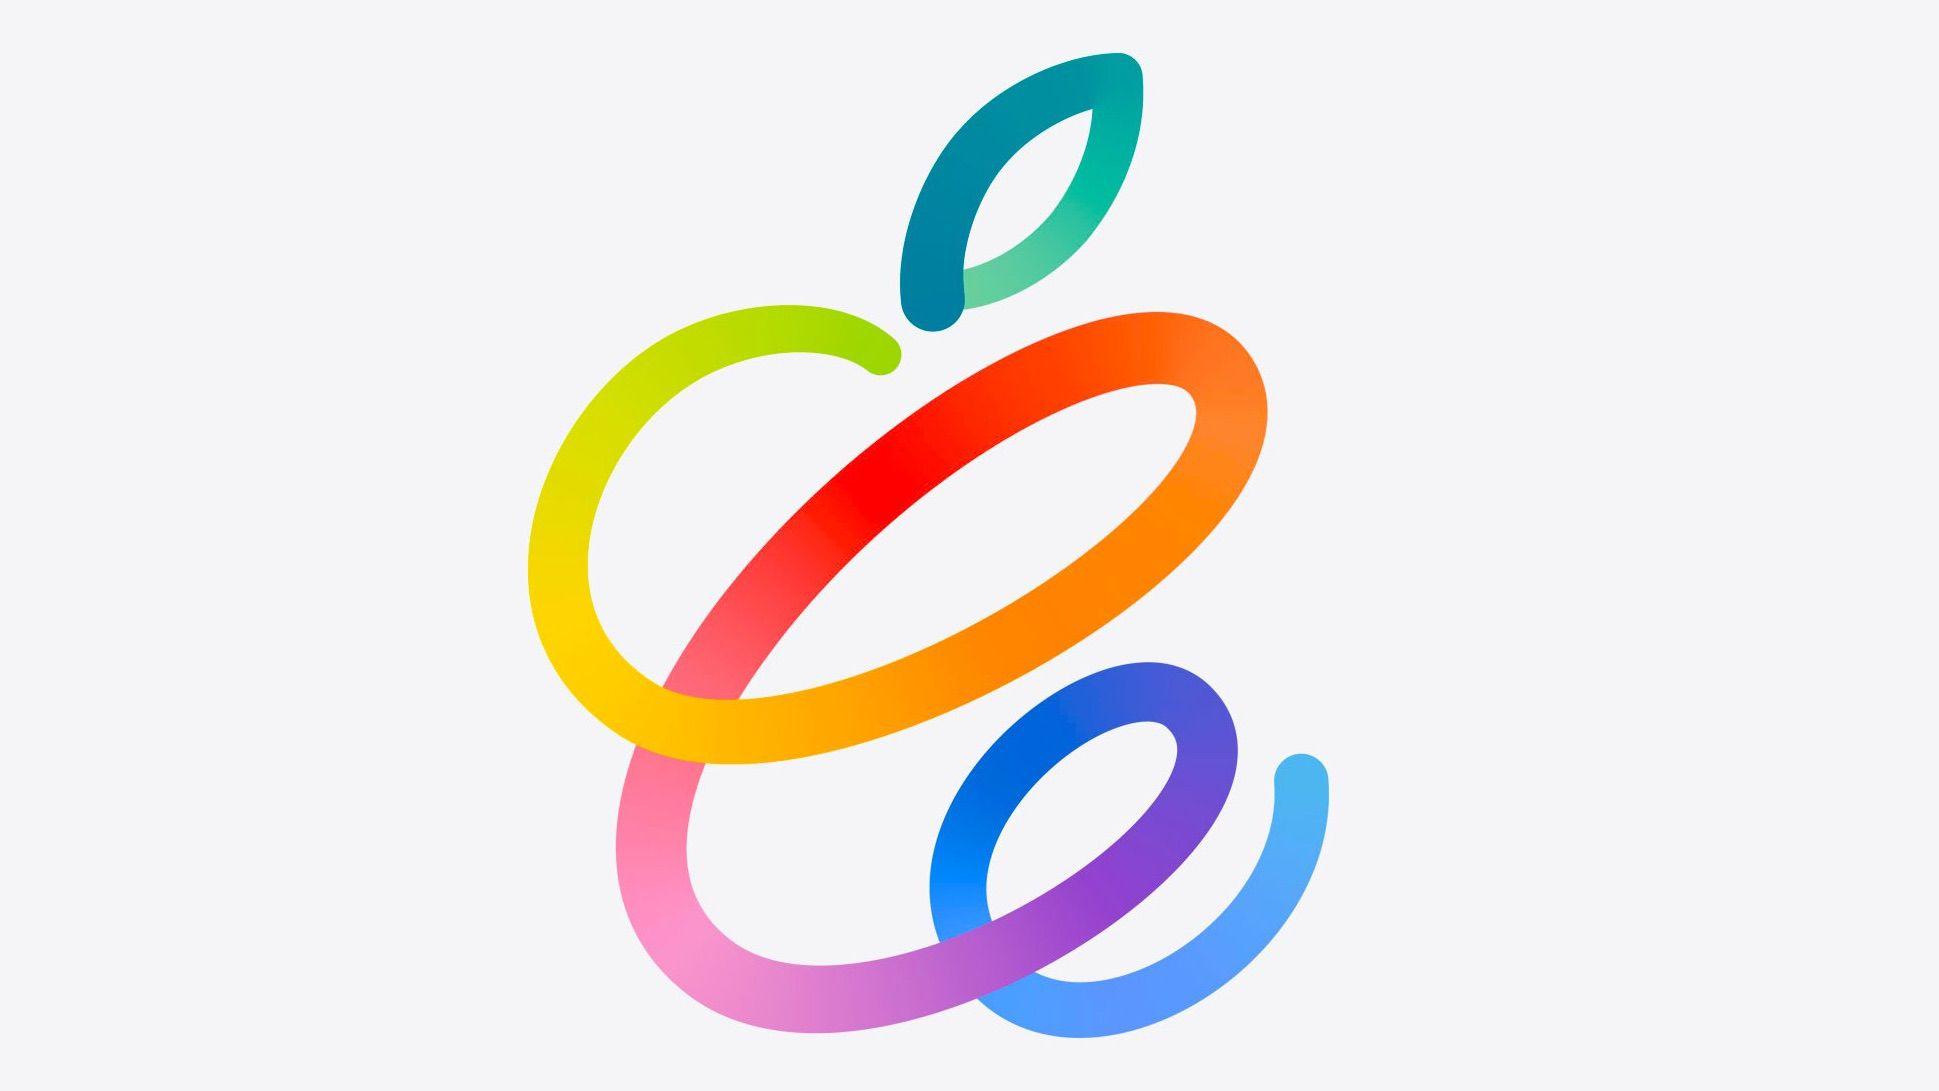 apple-event-hashflag.jpg